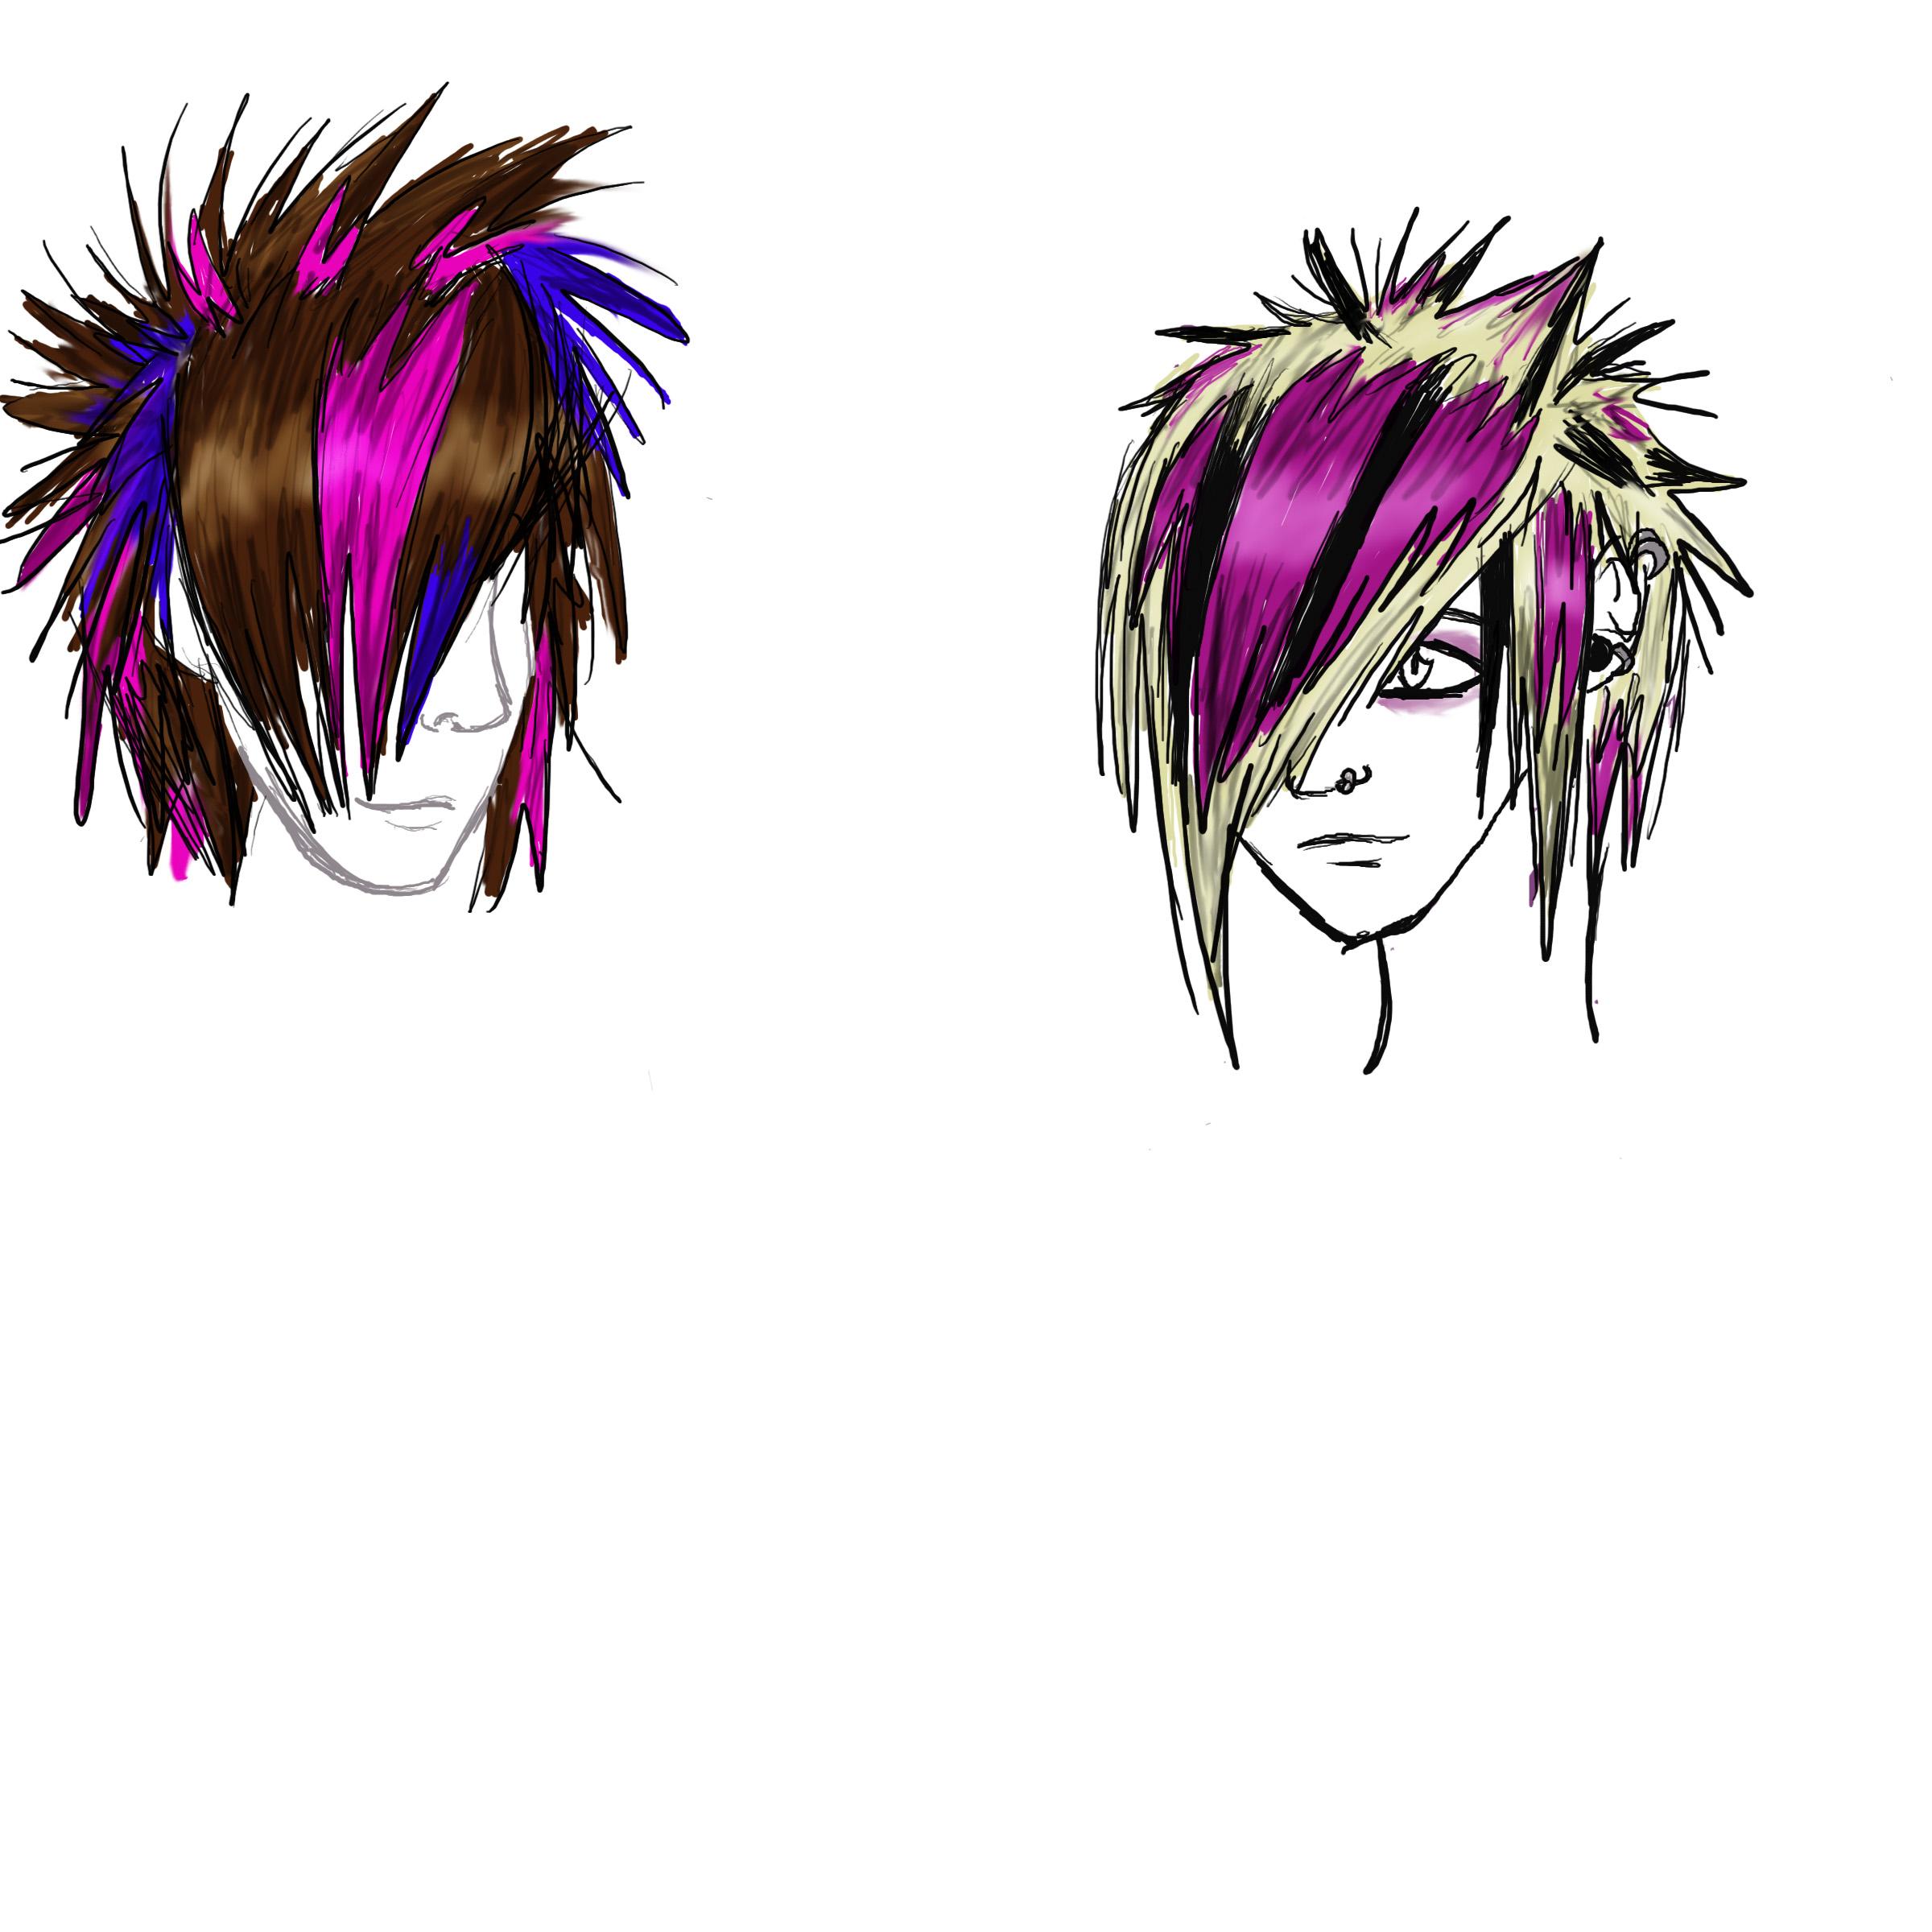 http://fc07.deviantart.net/fs17/f/2007/209/5/c/Emo_Hairstyles_0_o_by_BryluffsBert.jpg